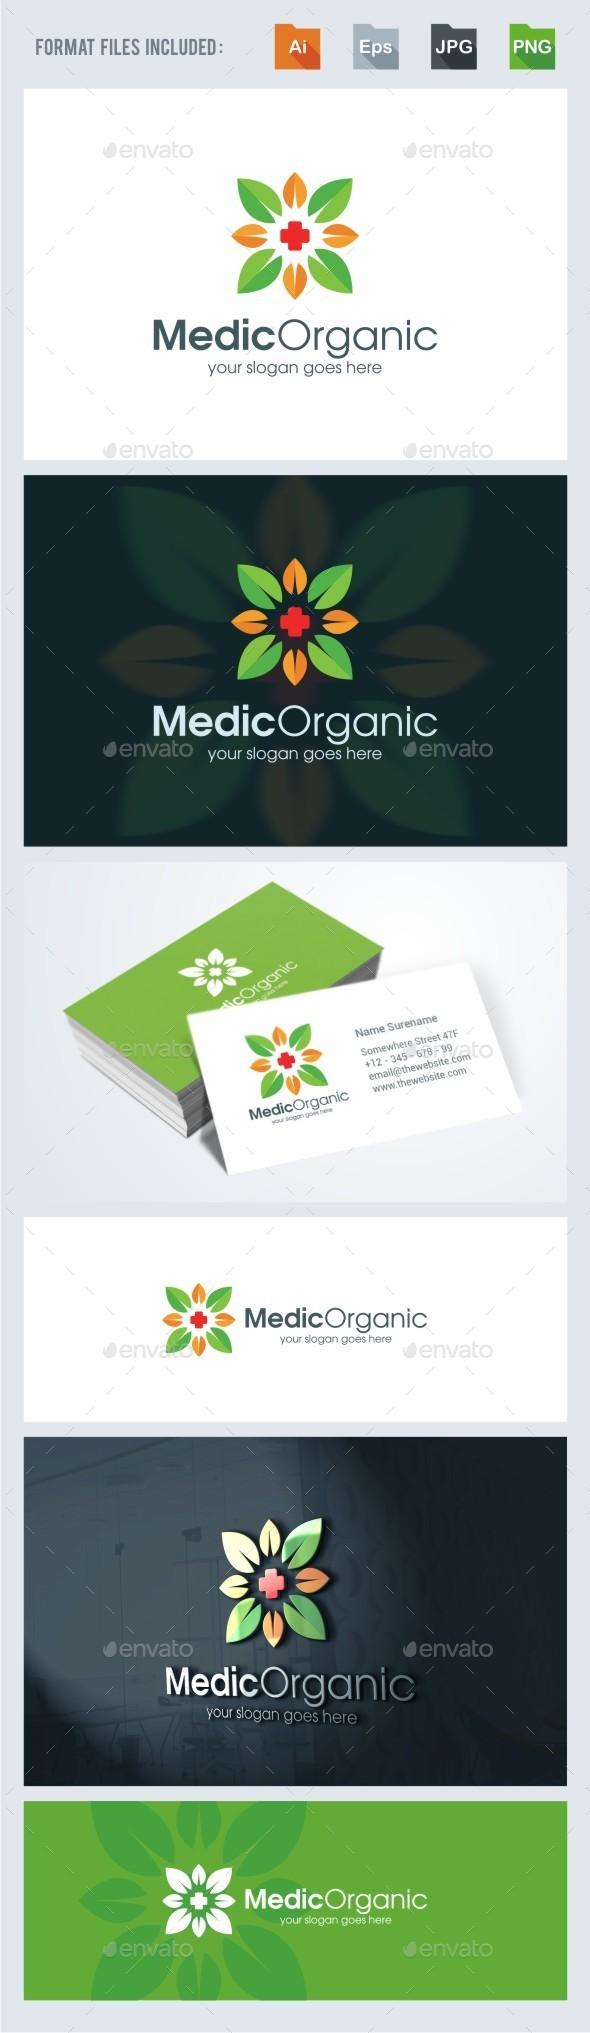 Medical Organic Logo Template